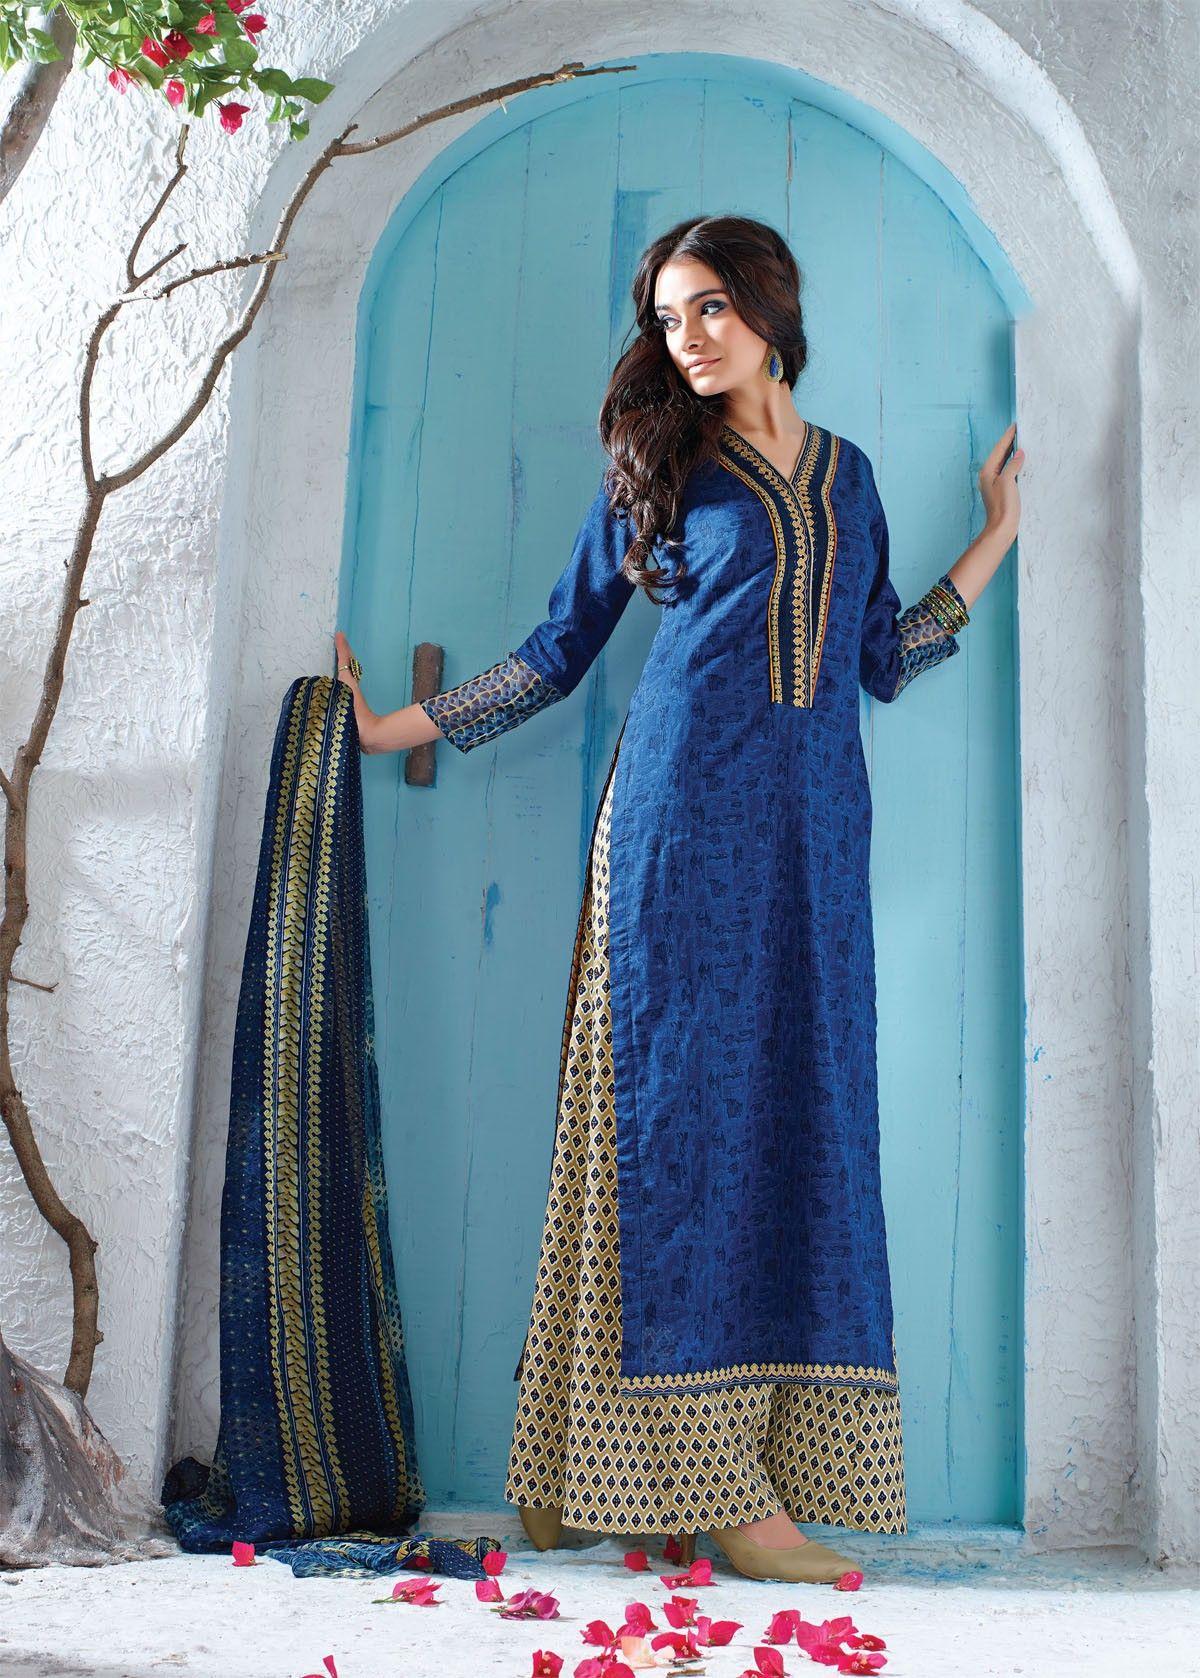 10-11_sp_1royal_blue_cotton_printed_salwar_kameez_with_palazzo_pant ...